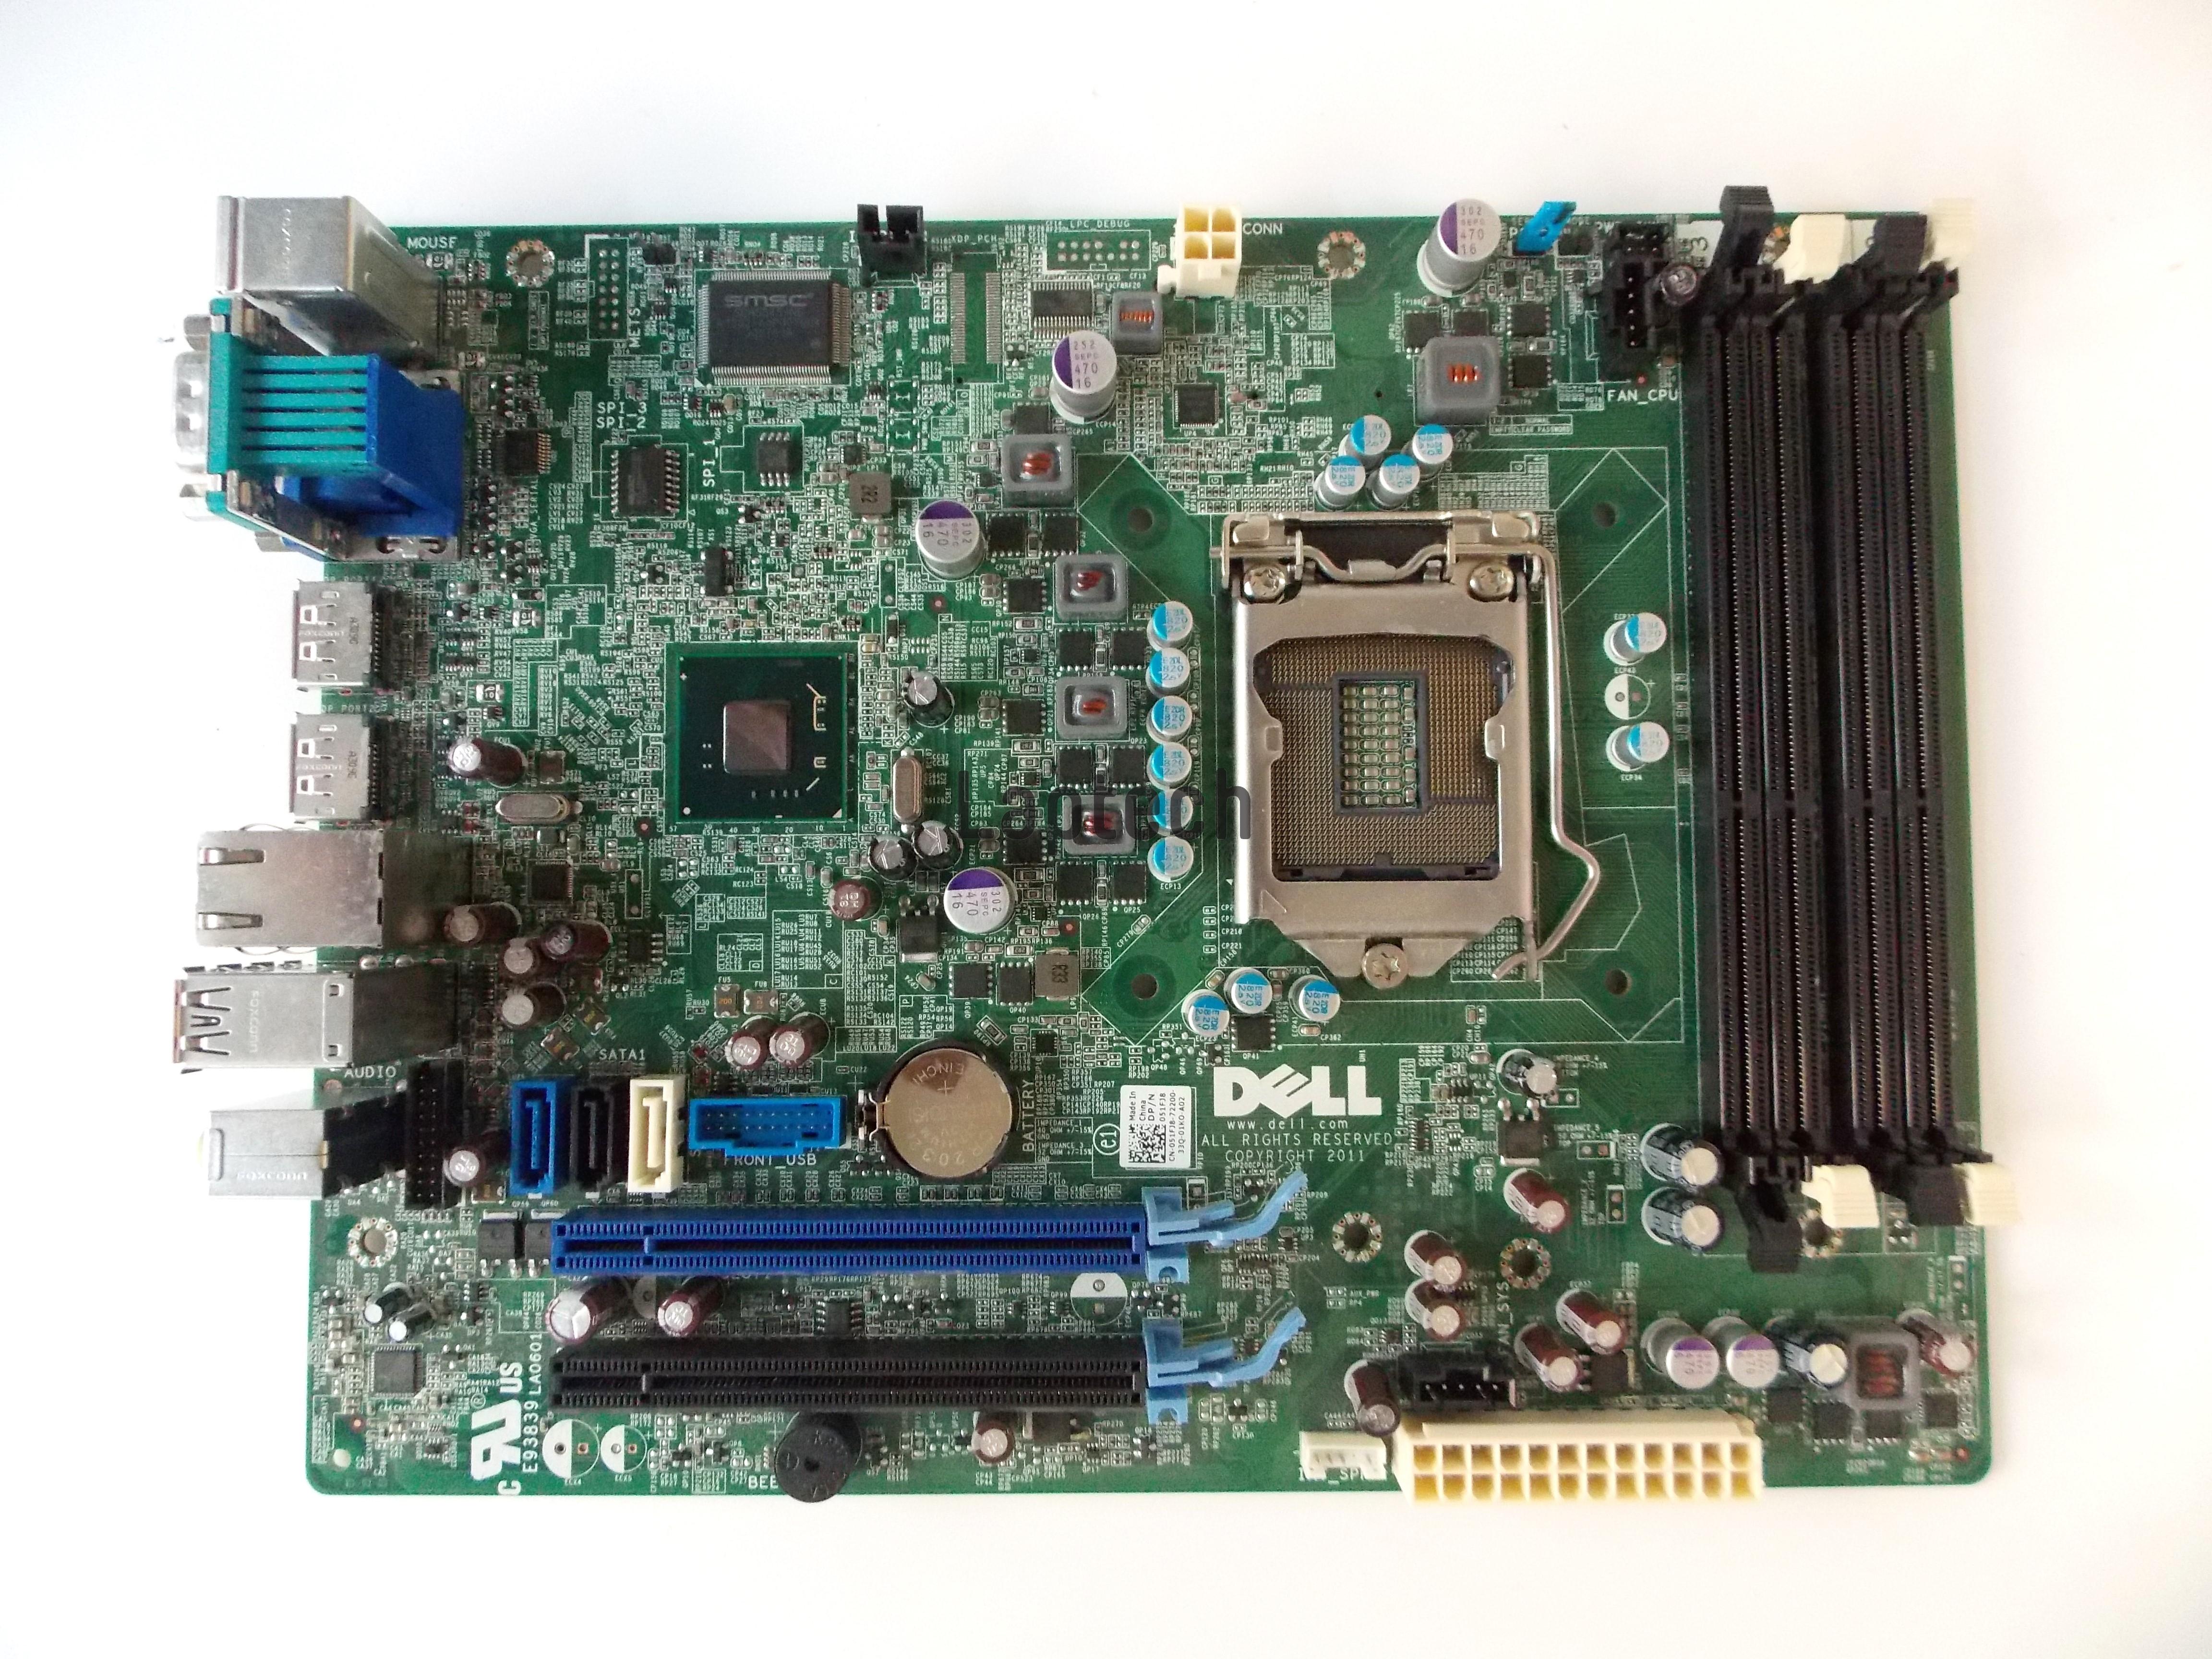 Dell Optiplex 9010 SFF system Motherboard K2V4W F3KHR 51FJ8 0M04X 0K2V4W  0F3KHR 051FJ8 00M04X WR7PY GXM1W